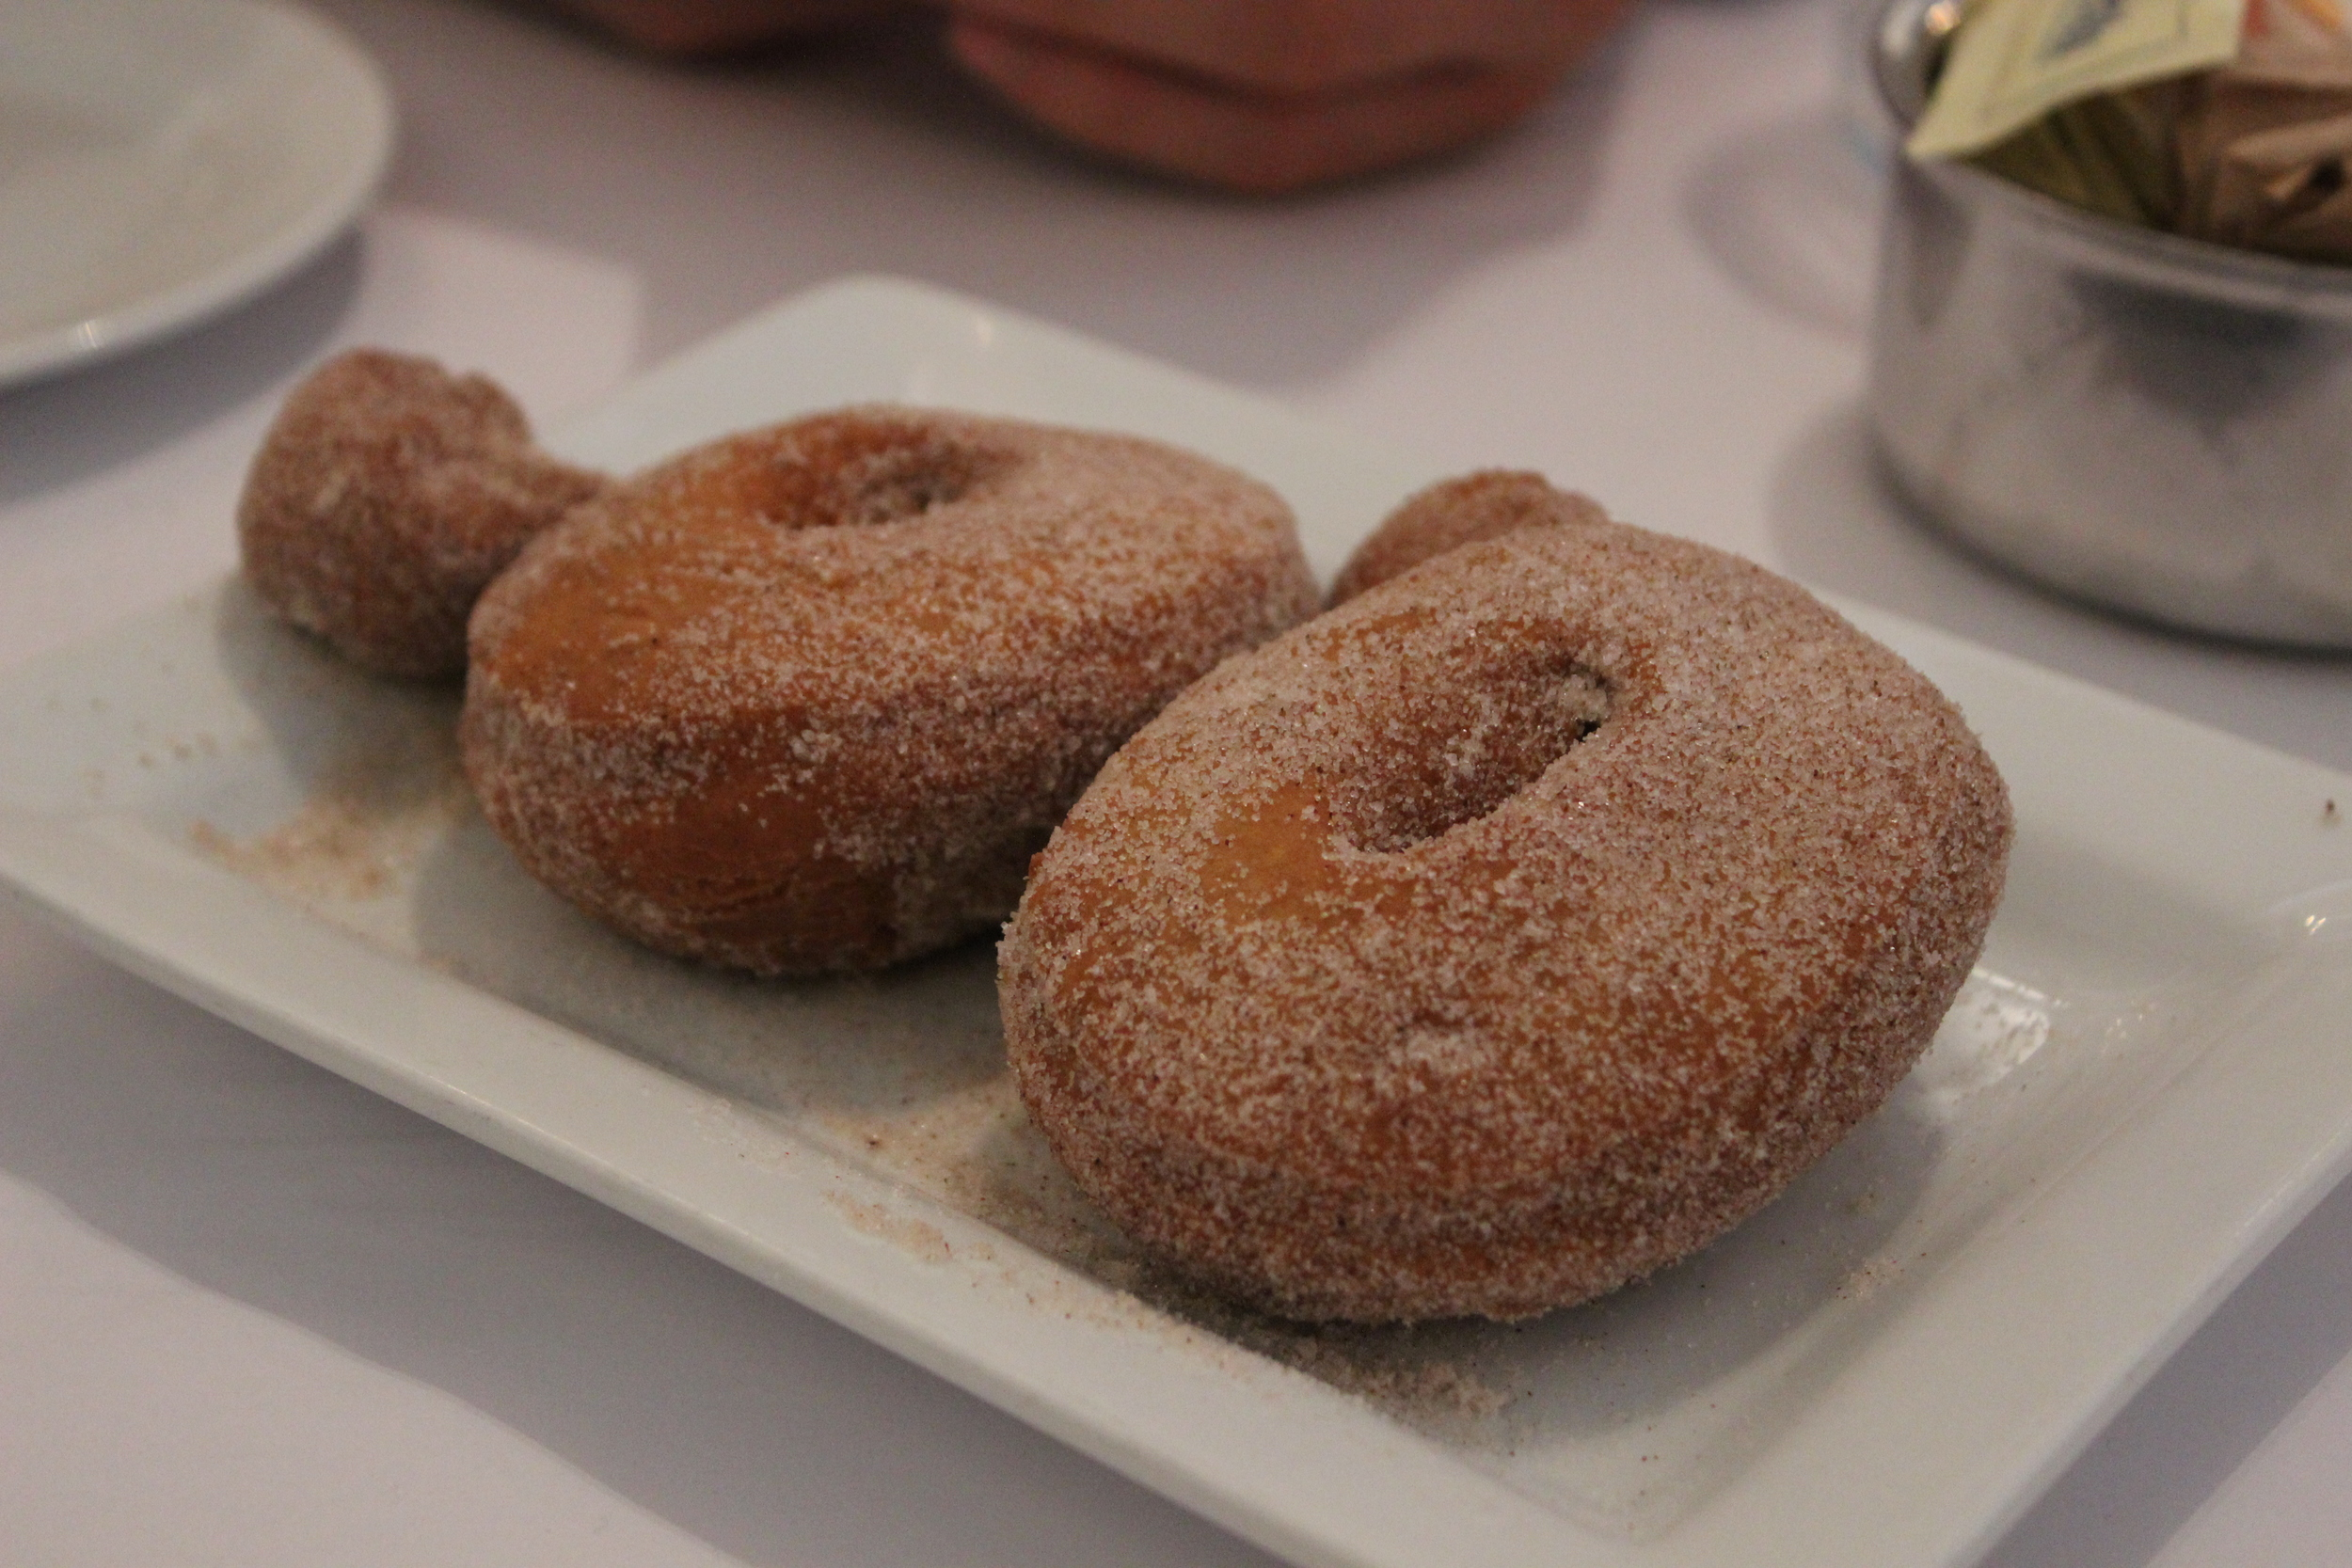 Warm Sugar & Spice Donuts